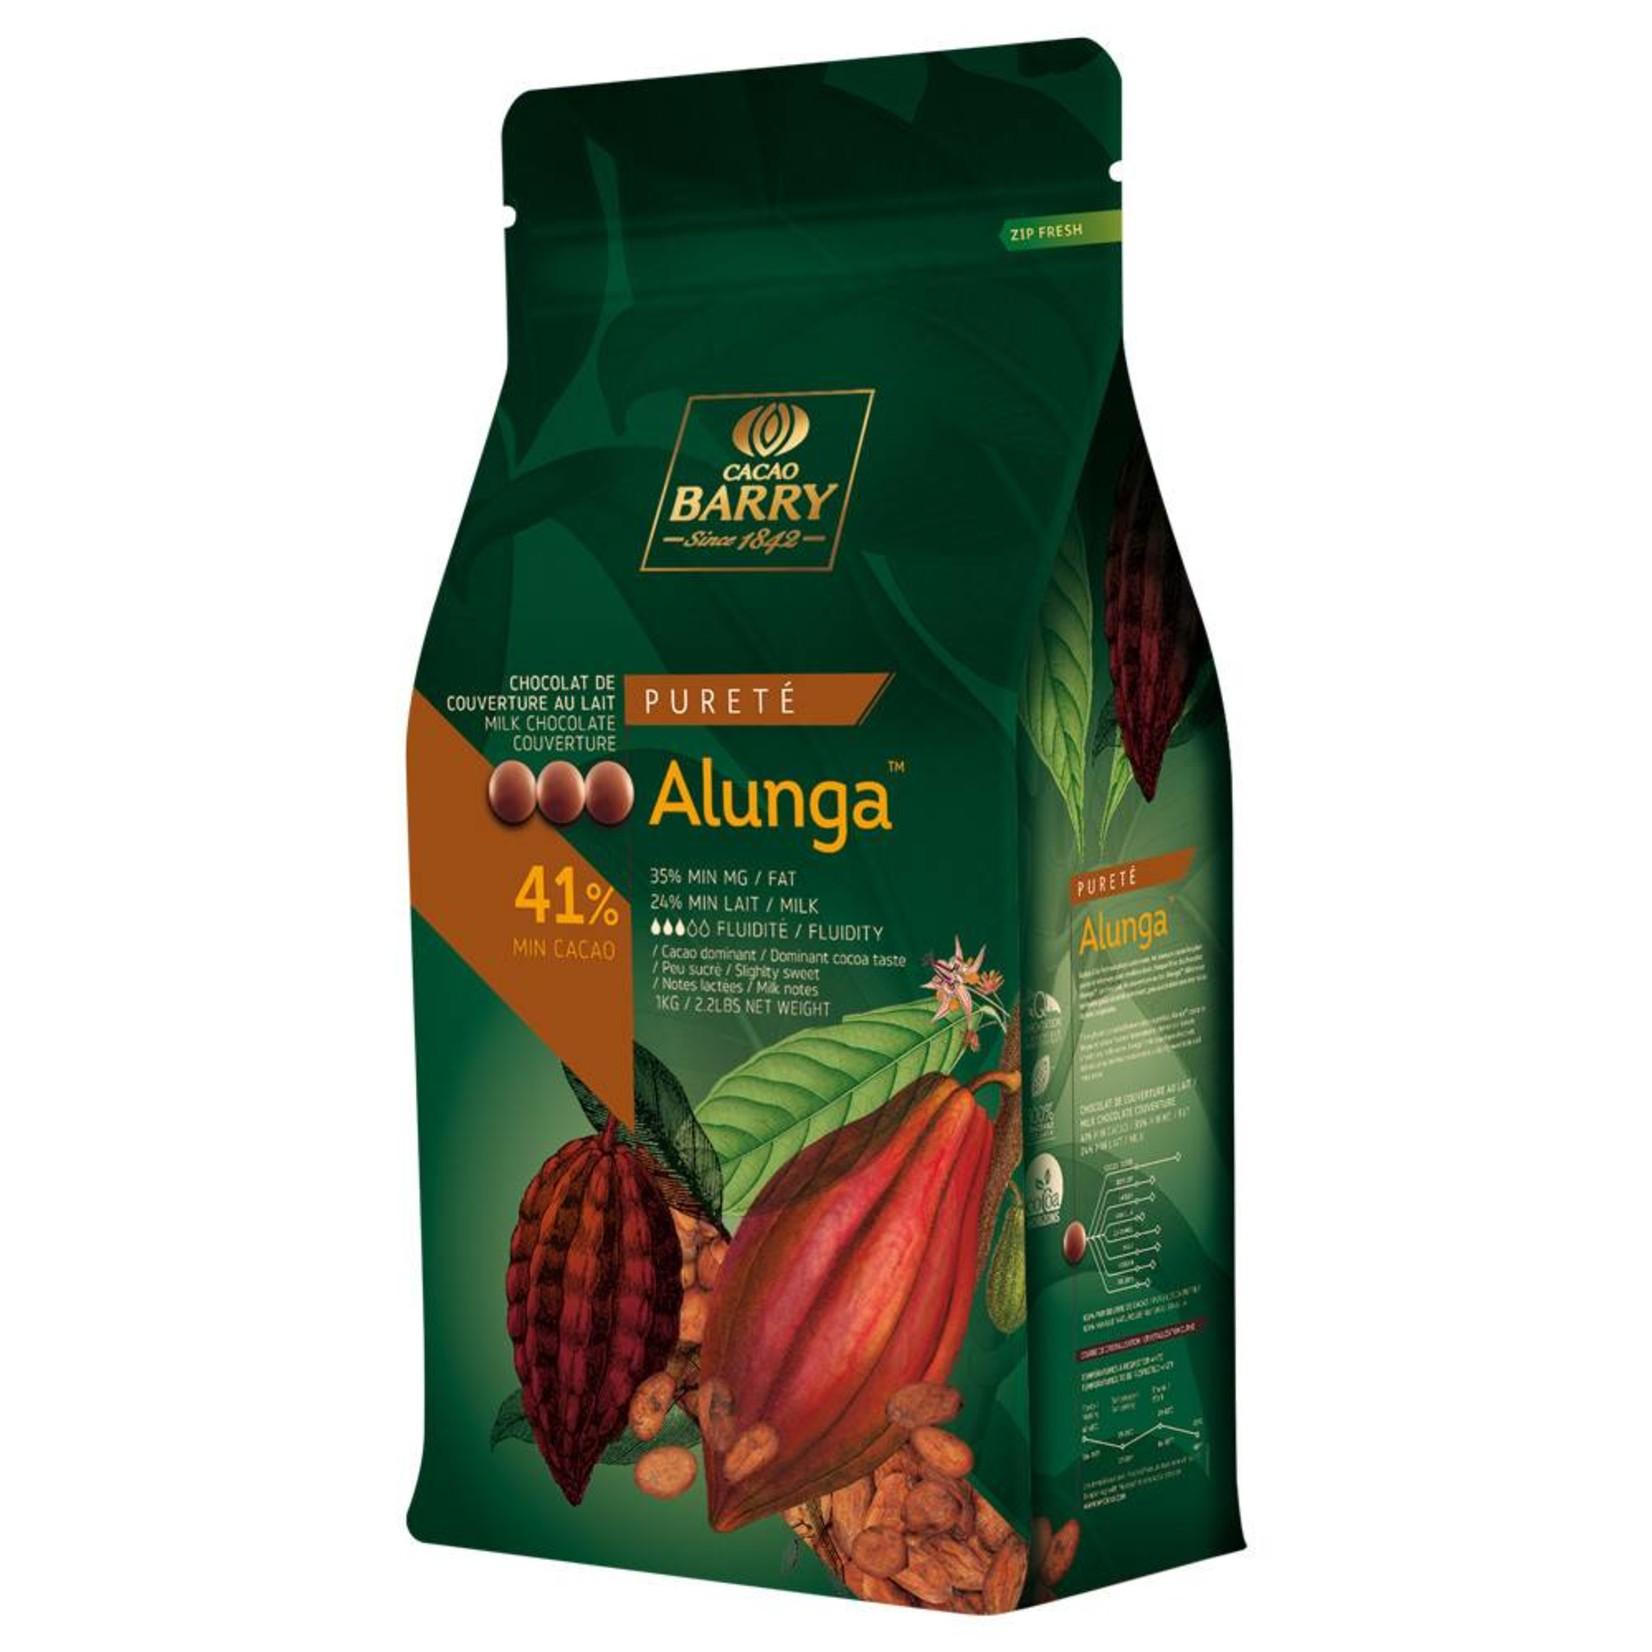 Cacao Barry Cacao Barry - Alunga Milk Chocolate 41% - 5kg/11 lb, CHM-Q41ALUN-US-U77